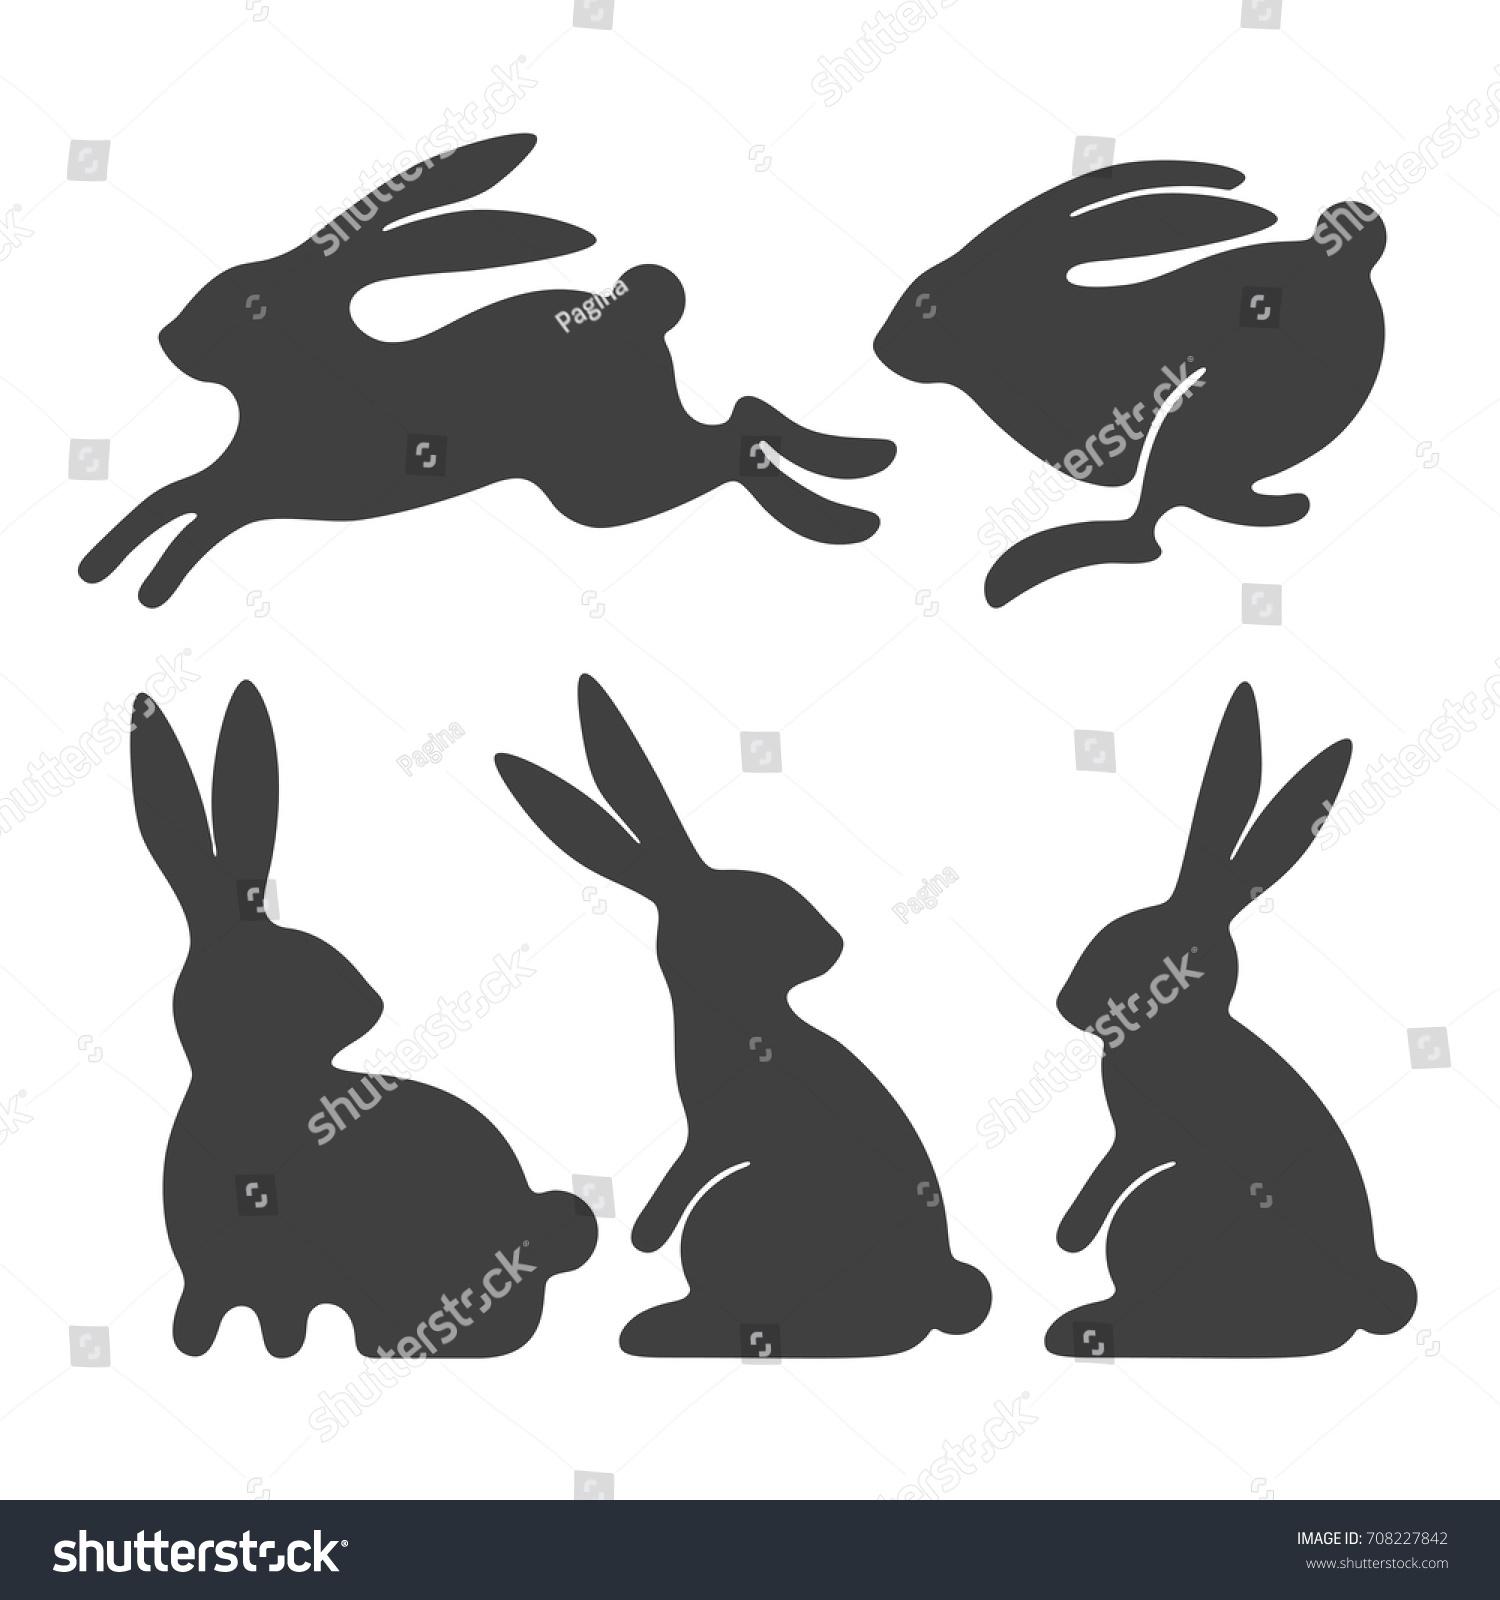 Rabbit Set Stylized Silhouettes Sitting Running Stock ...